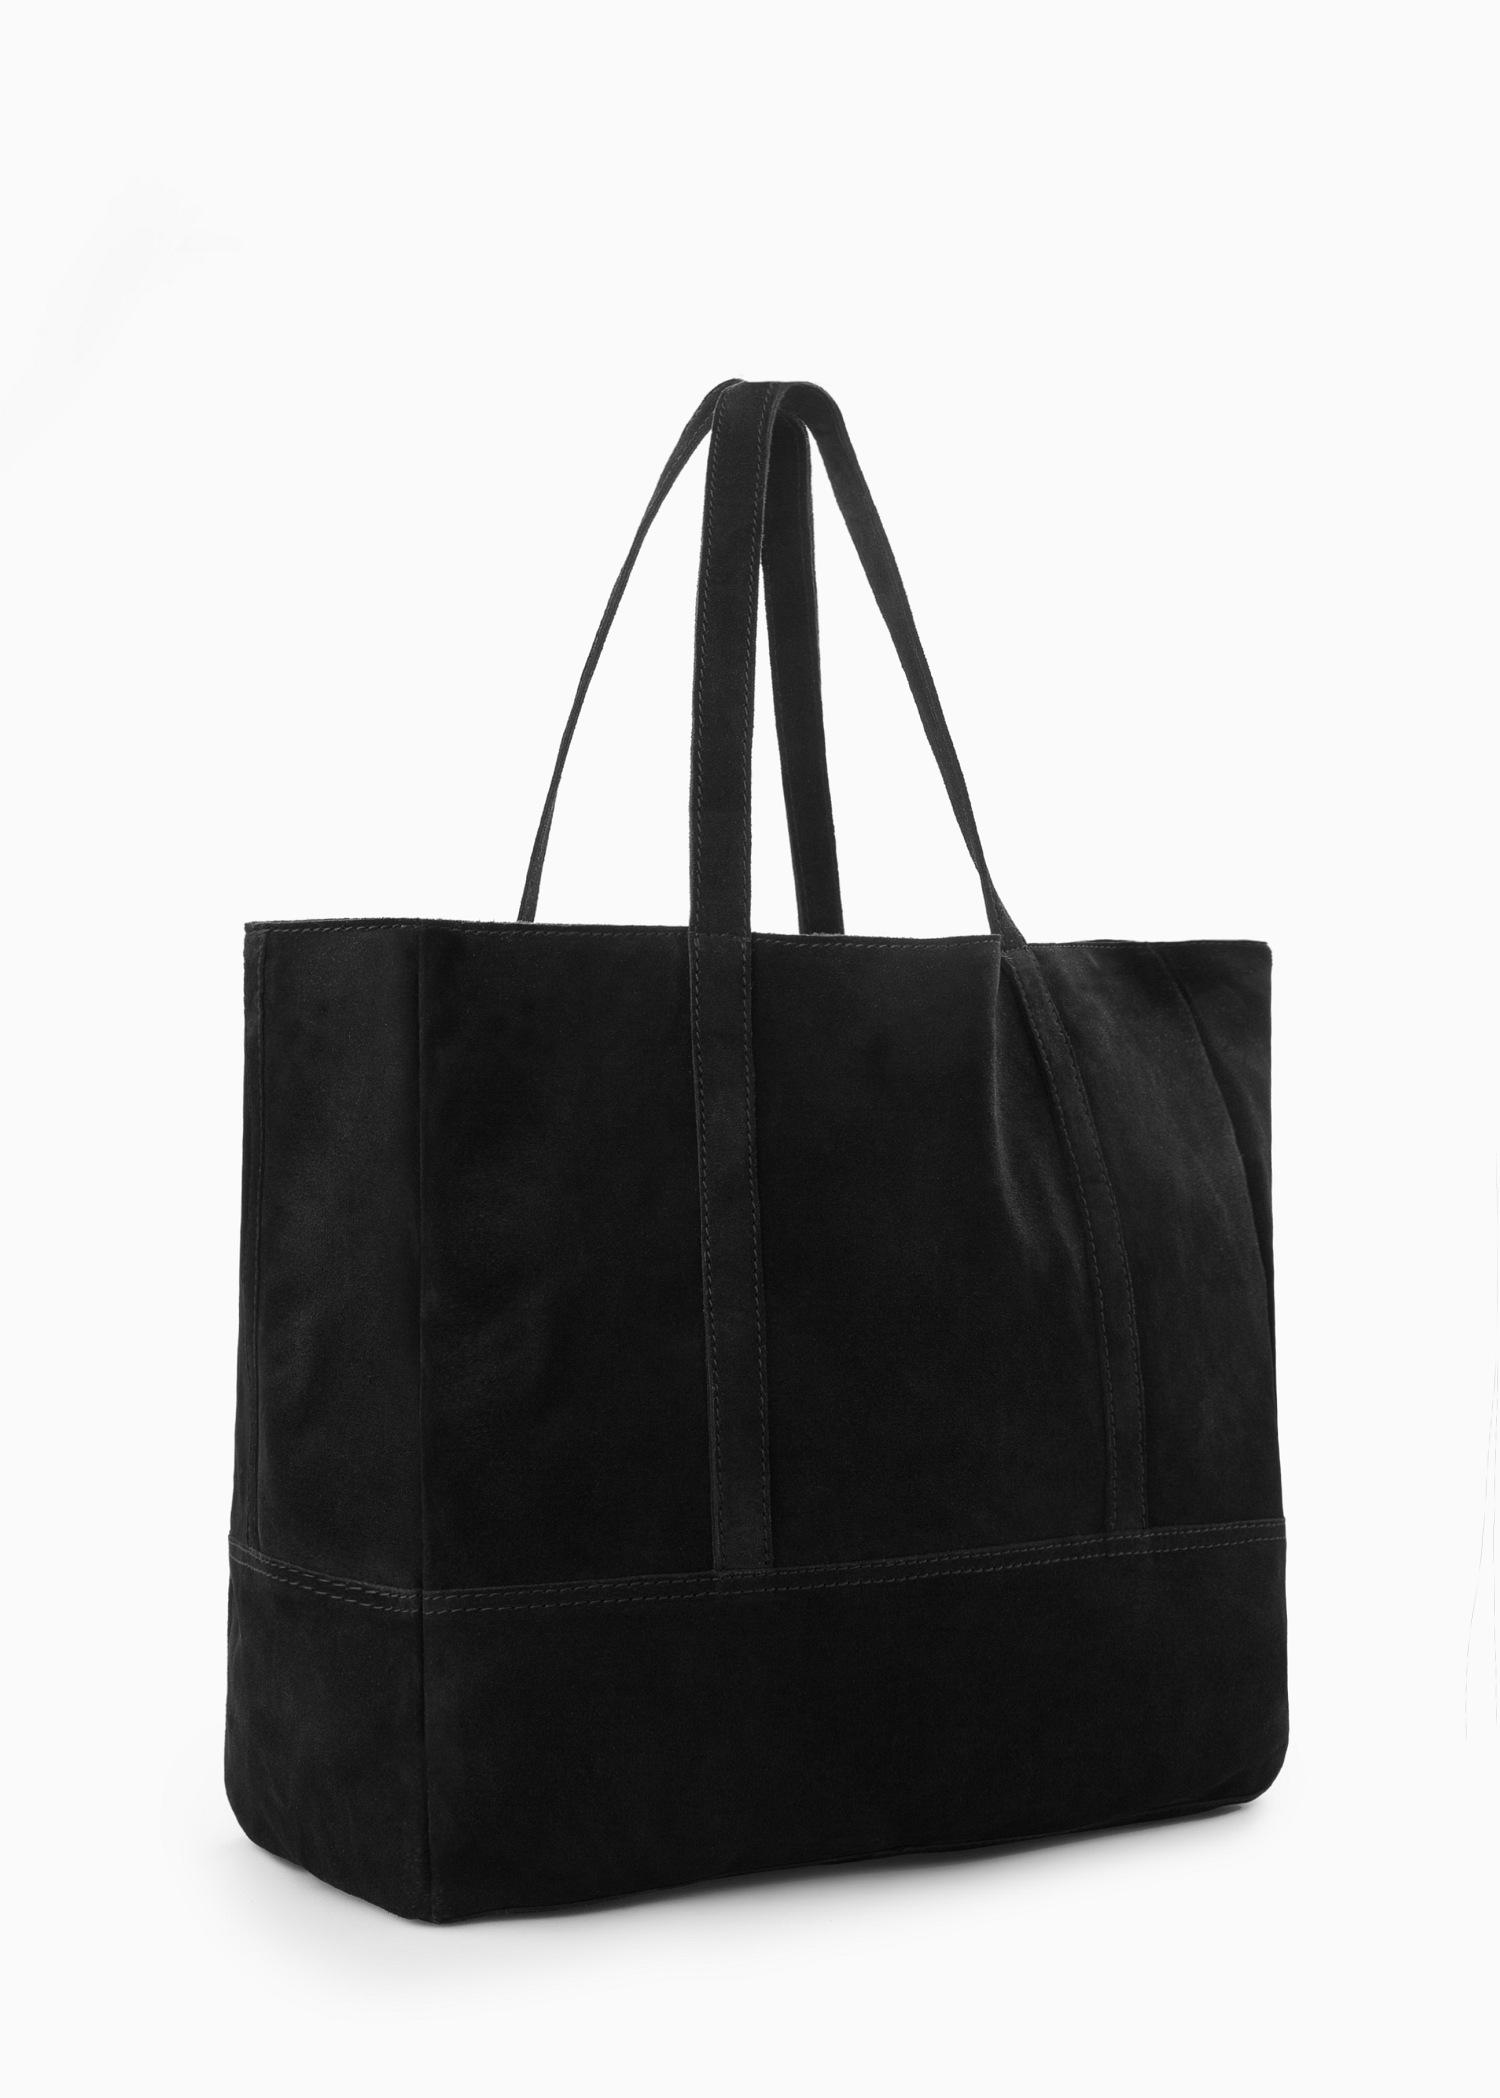 Mango Suede Shopper Bag in Black | Lyst